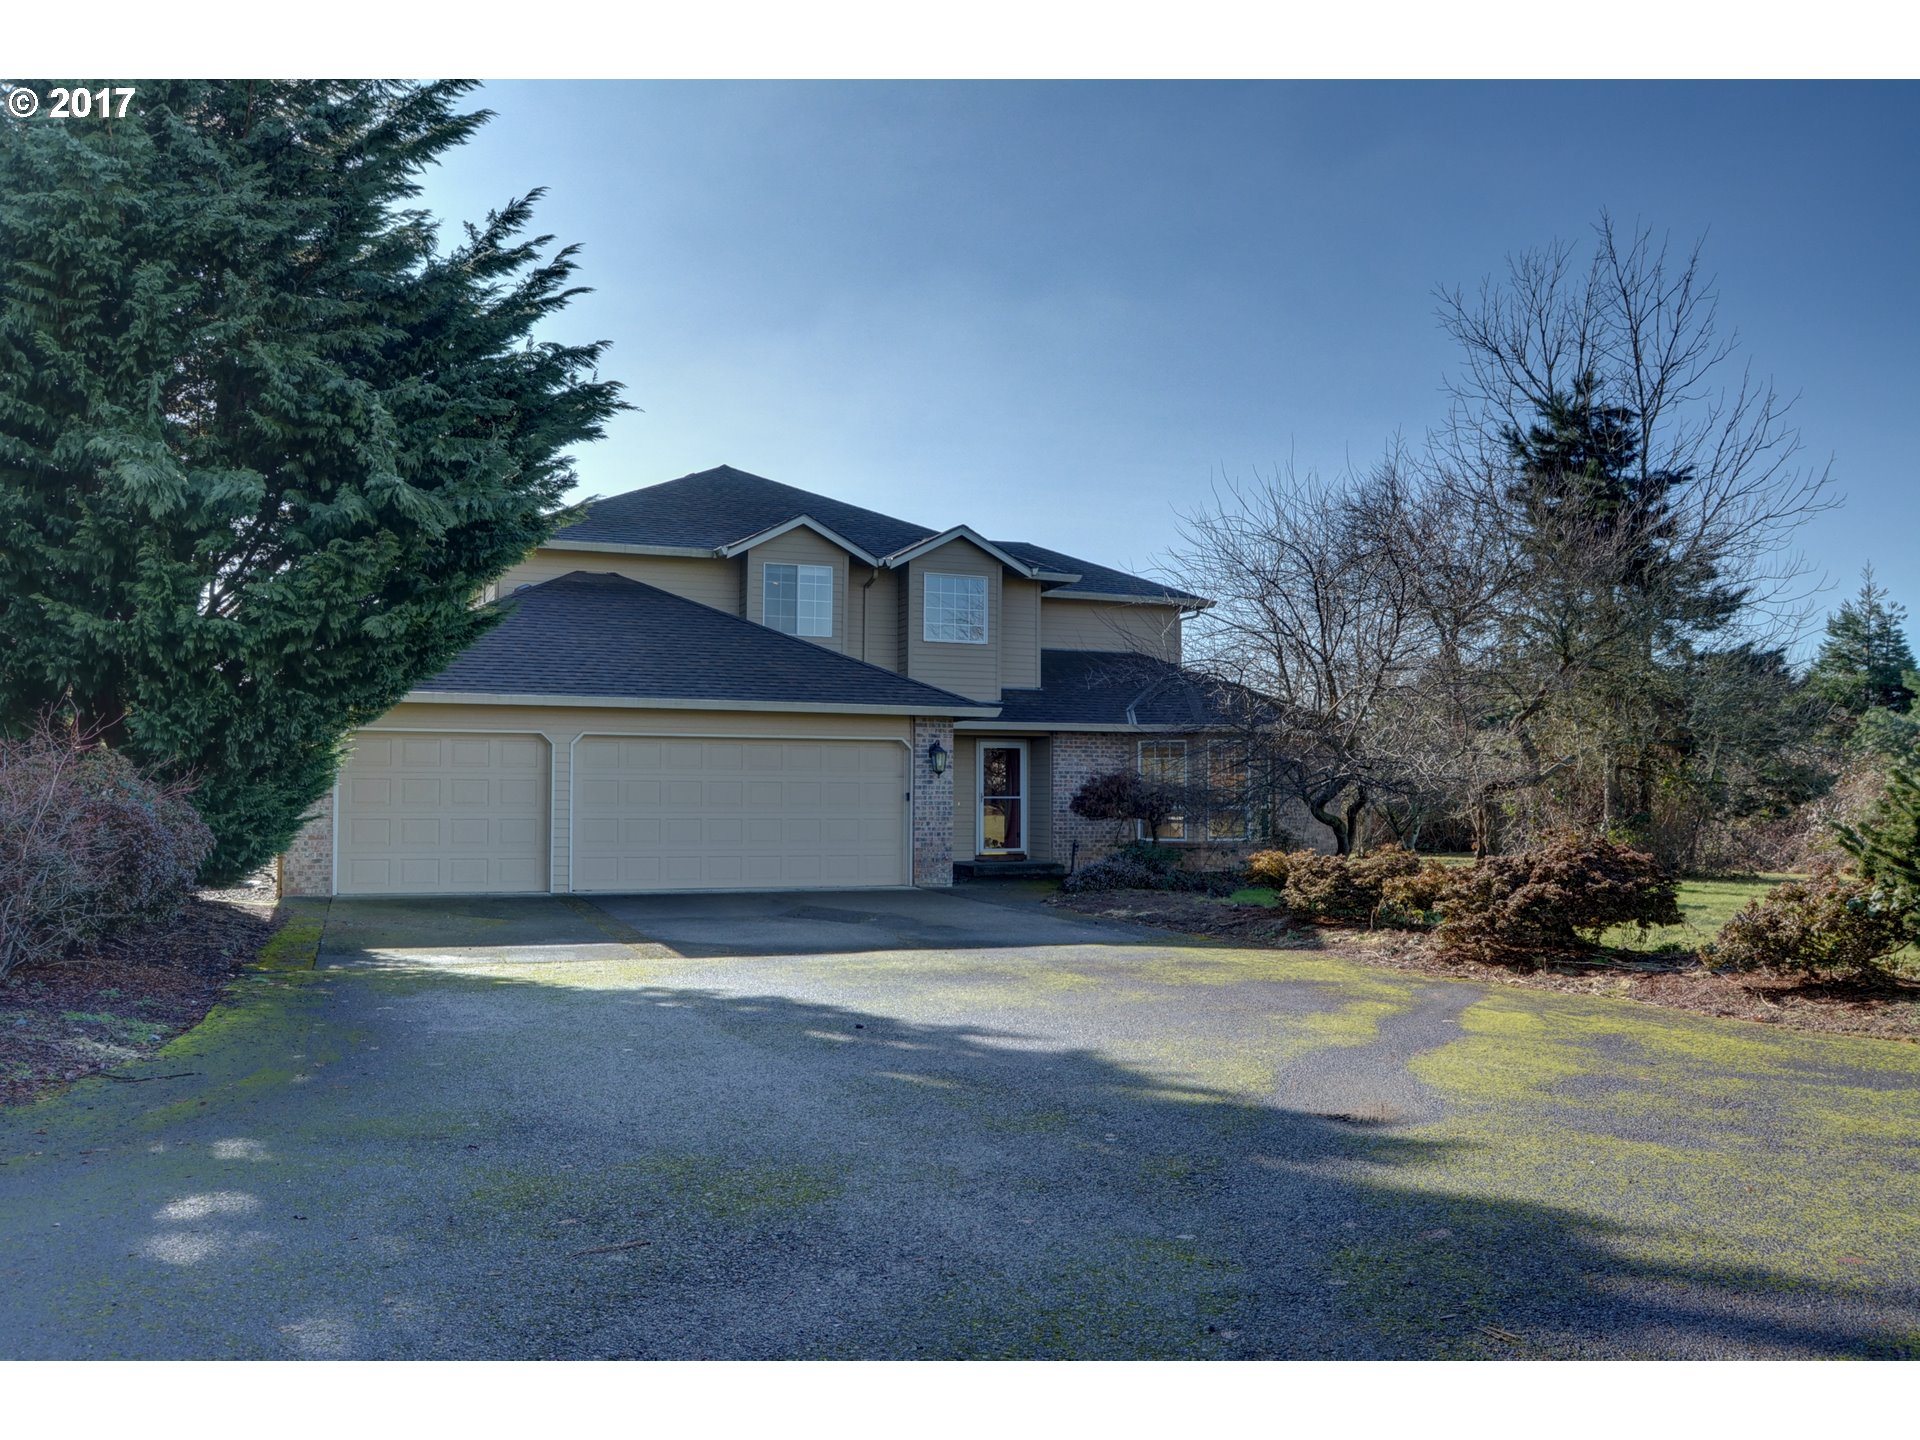 2315 NW 151ST ST, Vancouver, WA 98685